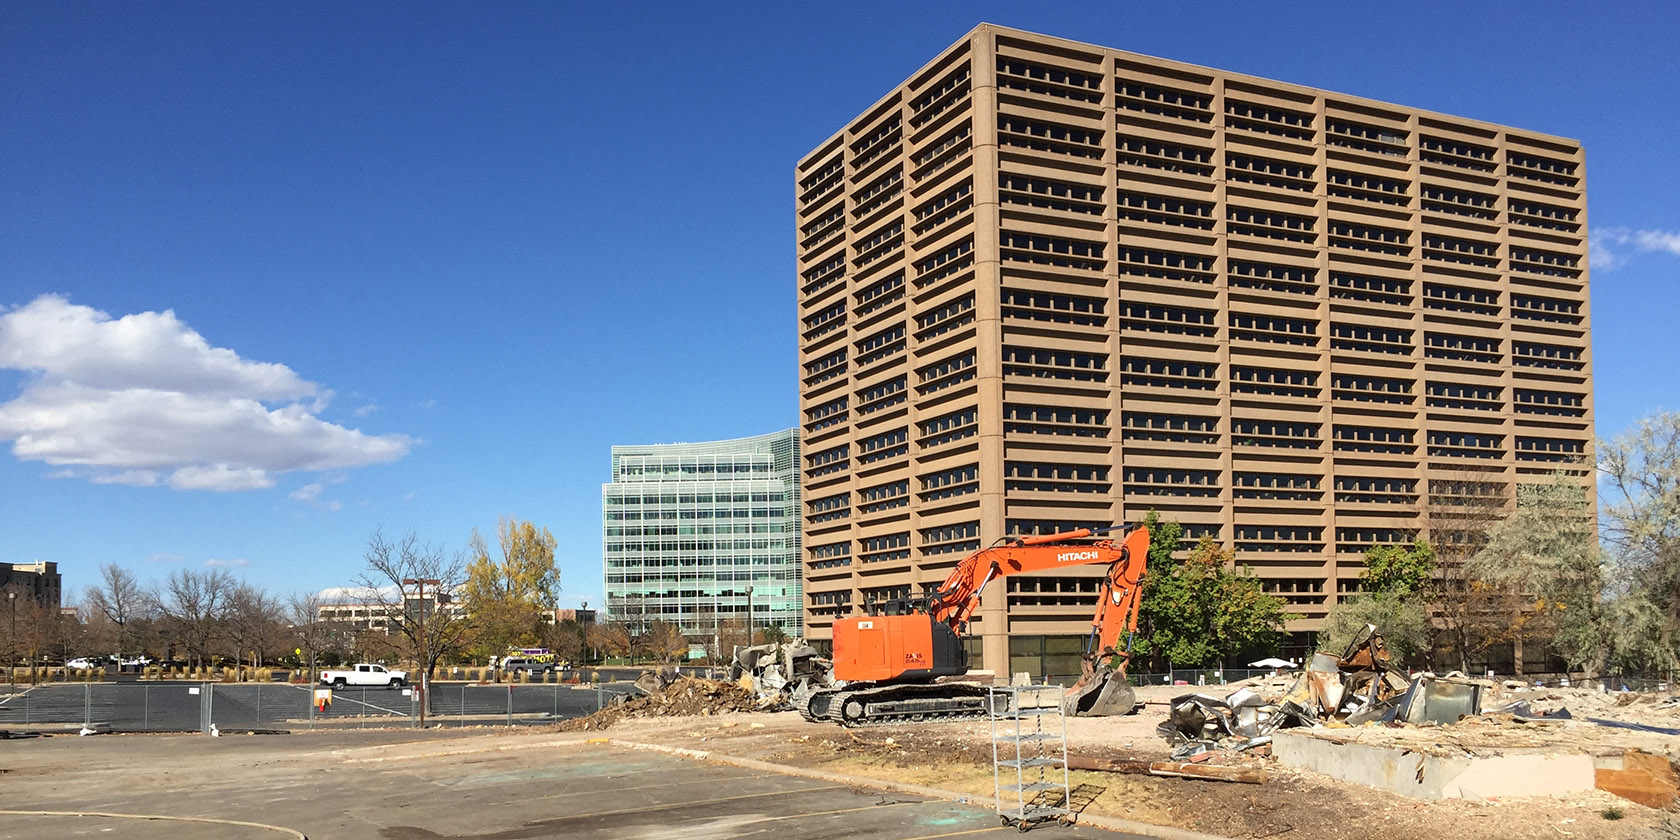 2016 1029 Demolition Complete